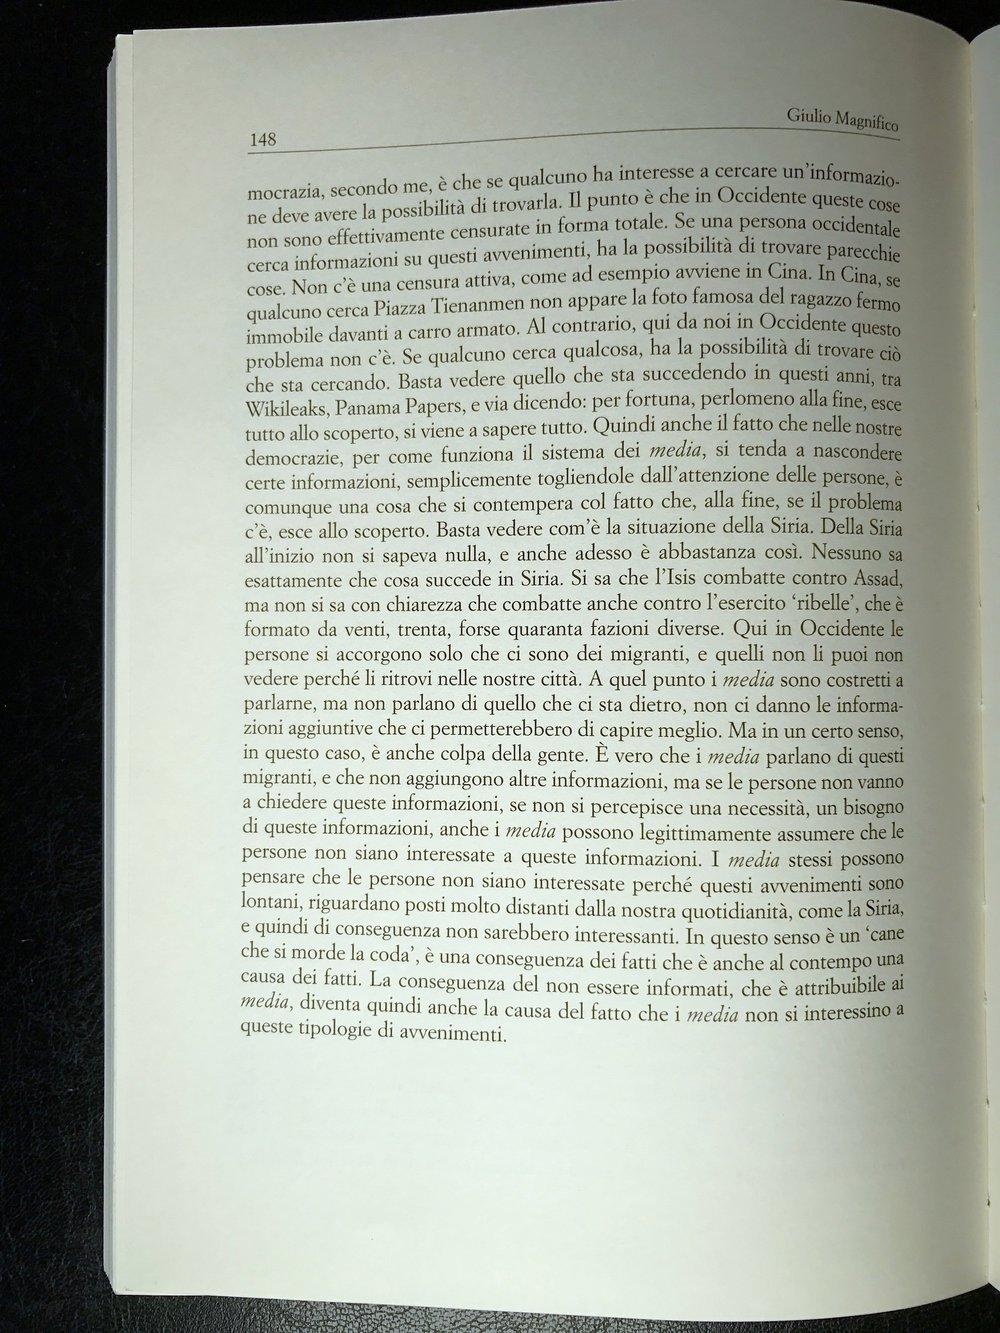 IMG_3865.JPG